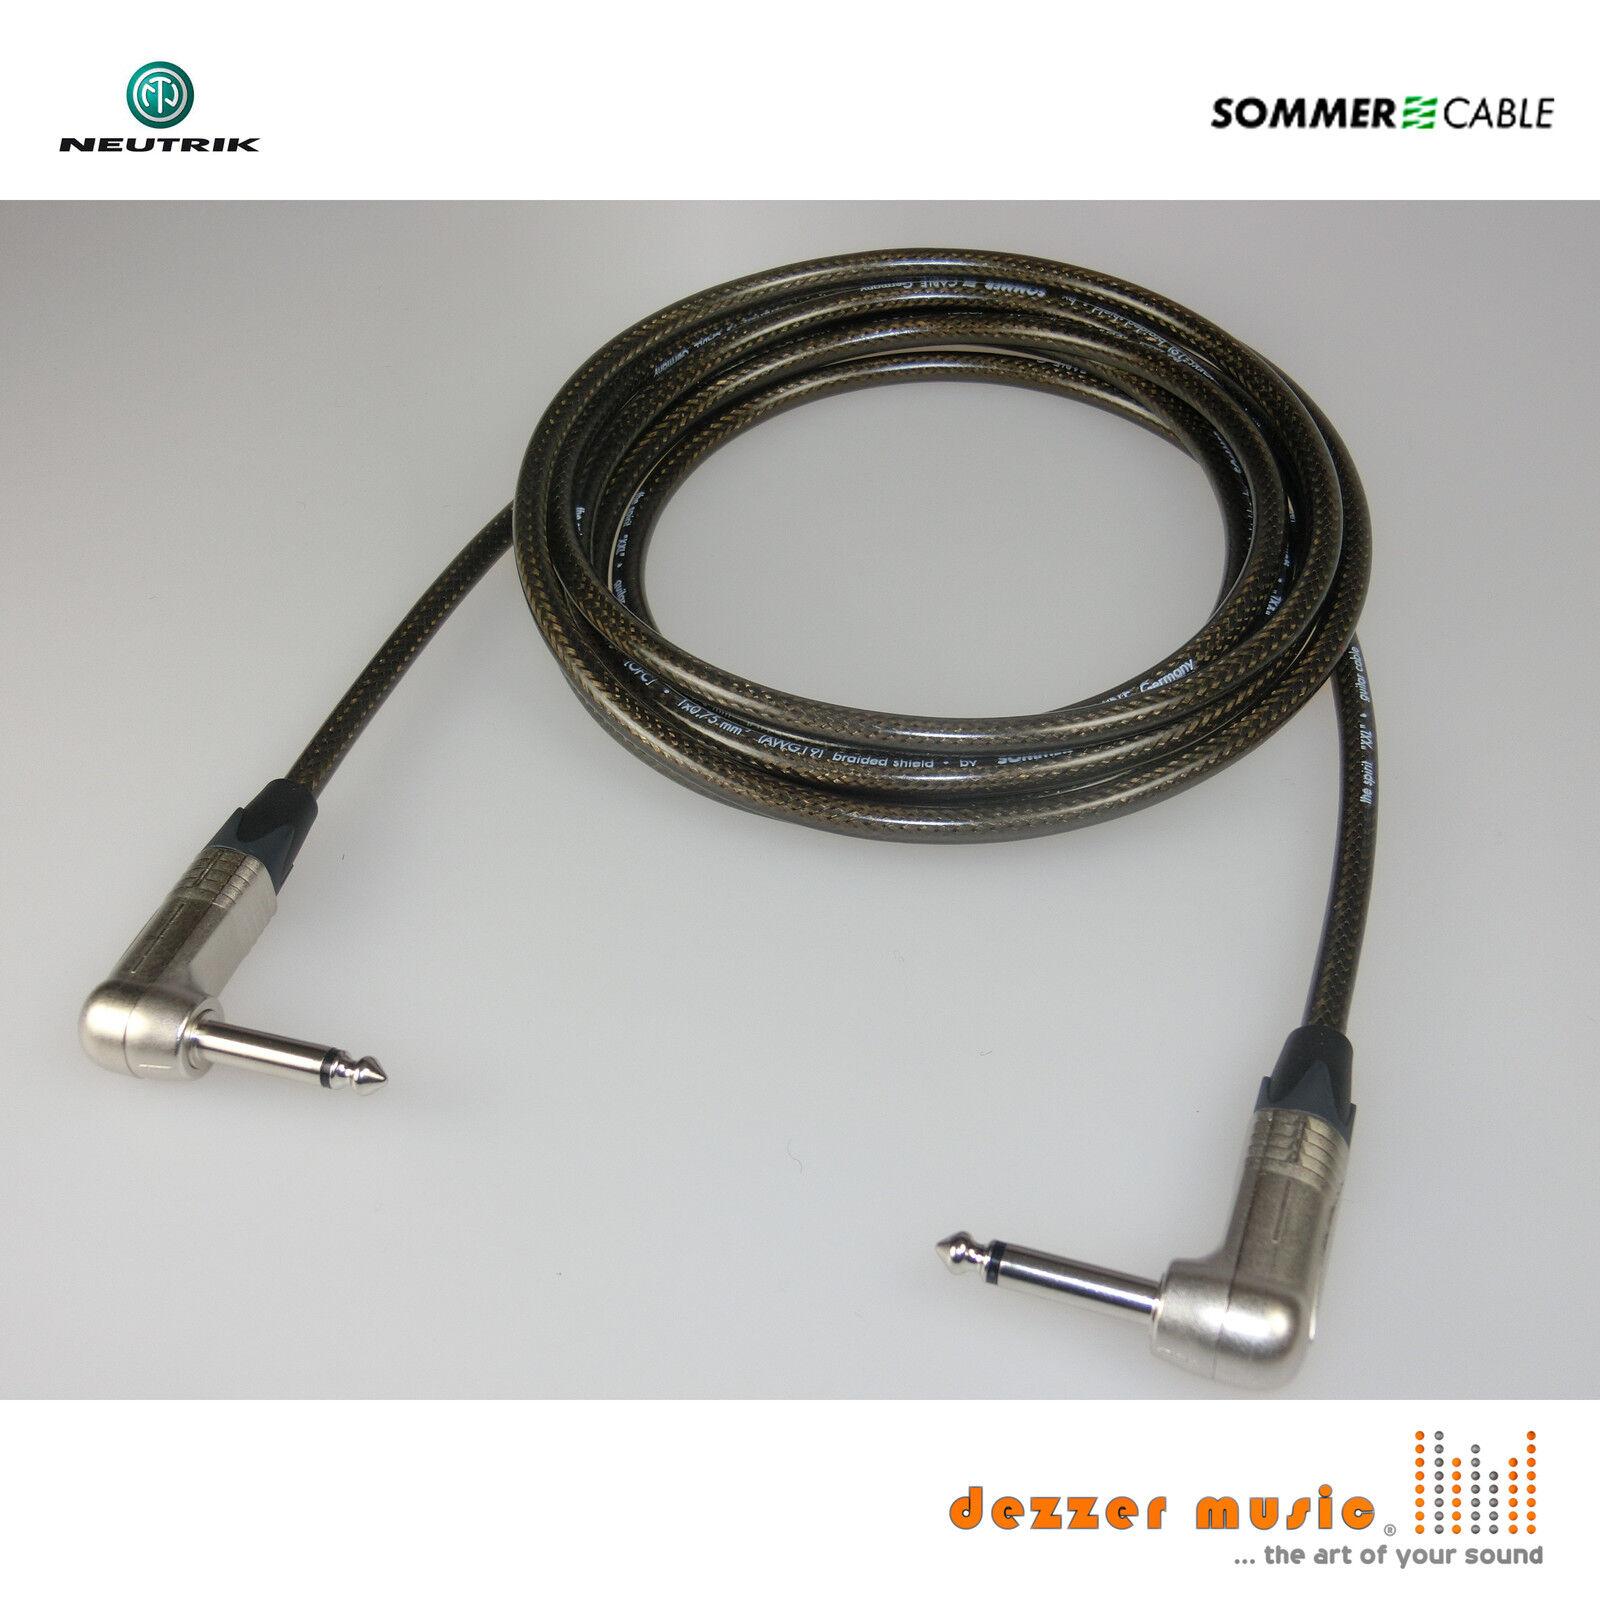 10m Gitarrenkabel SPIRIT XXL Sommer Cable Neutrik Klinke 6,3 mm Winkel-Winkel